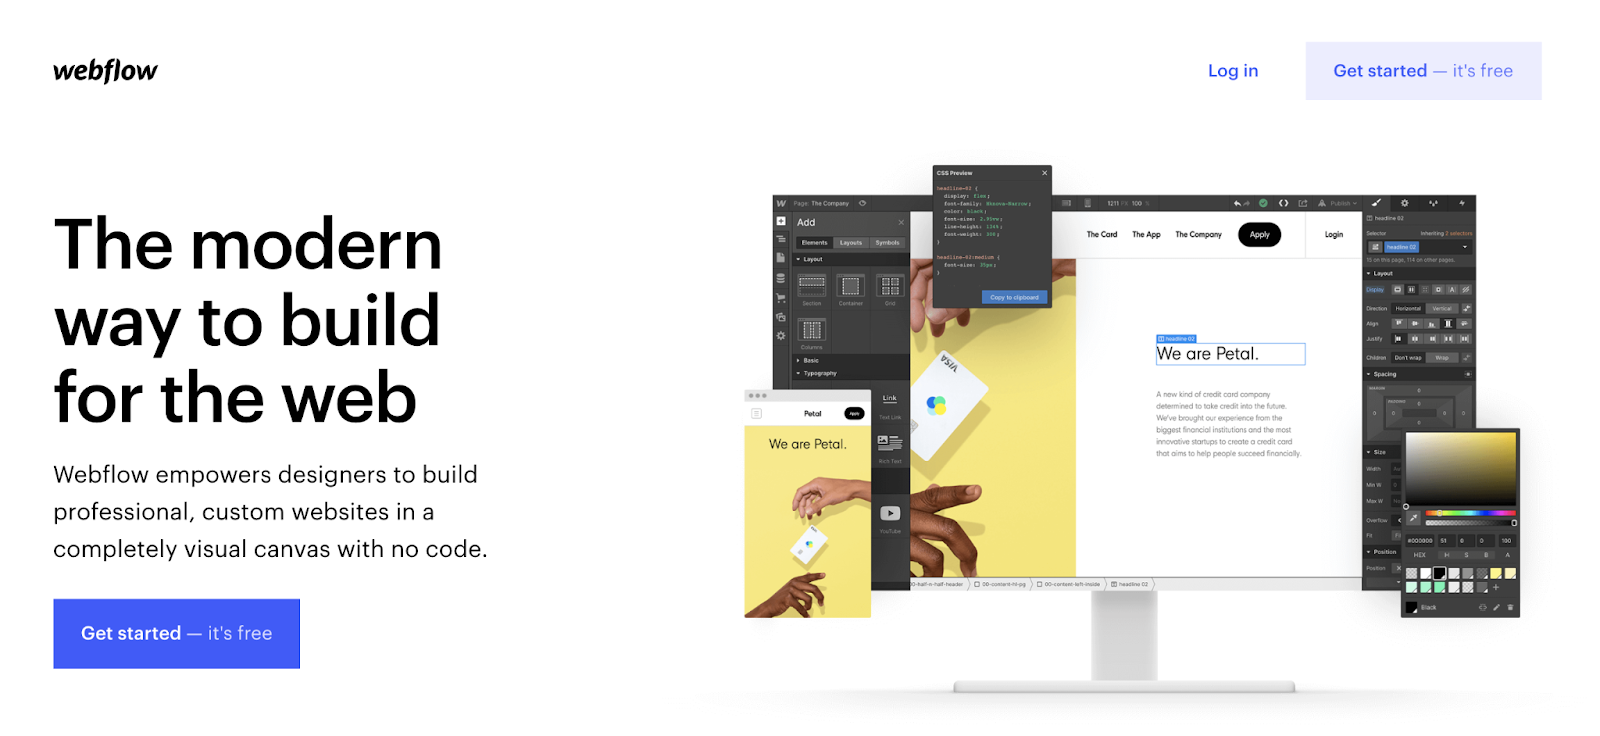 Webflow: best tool for UX designers